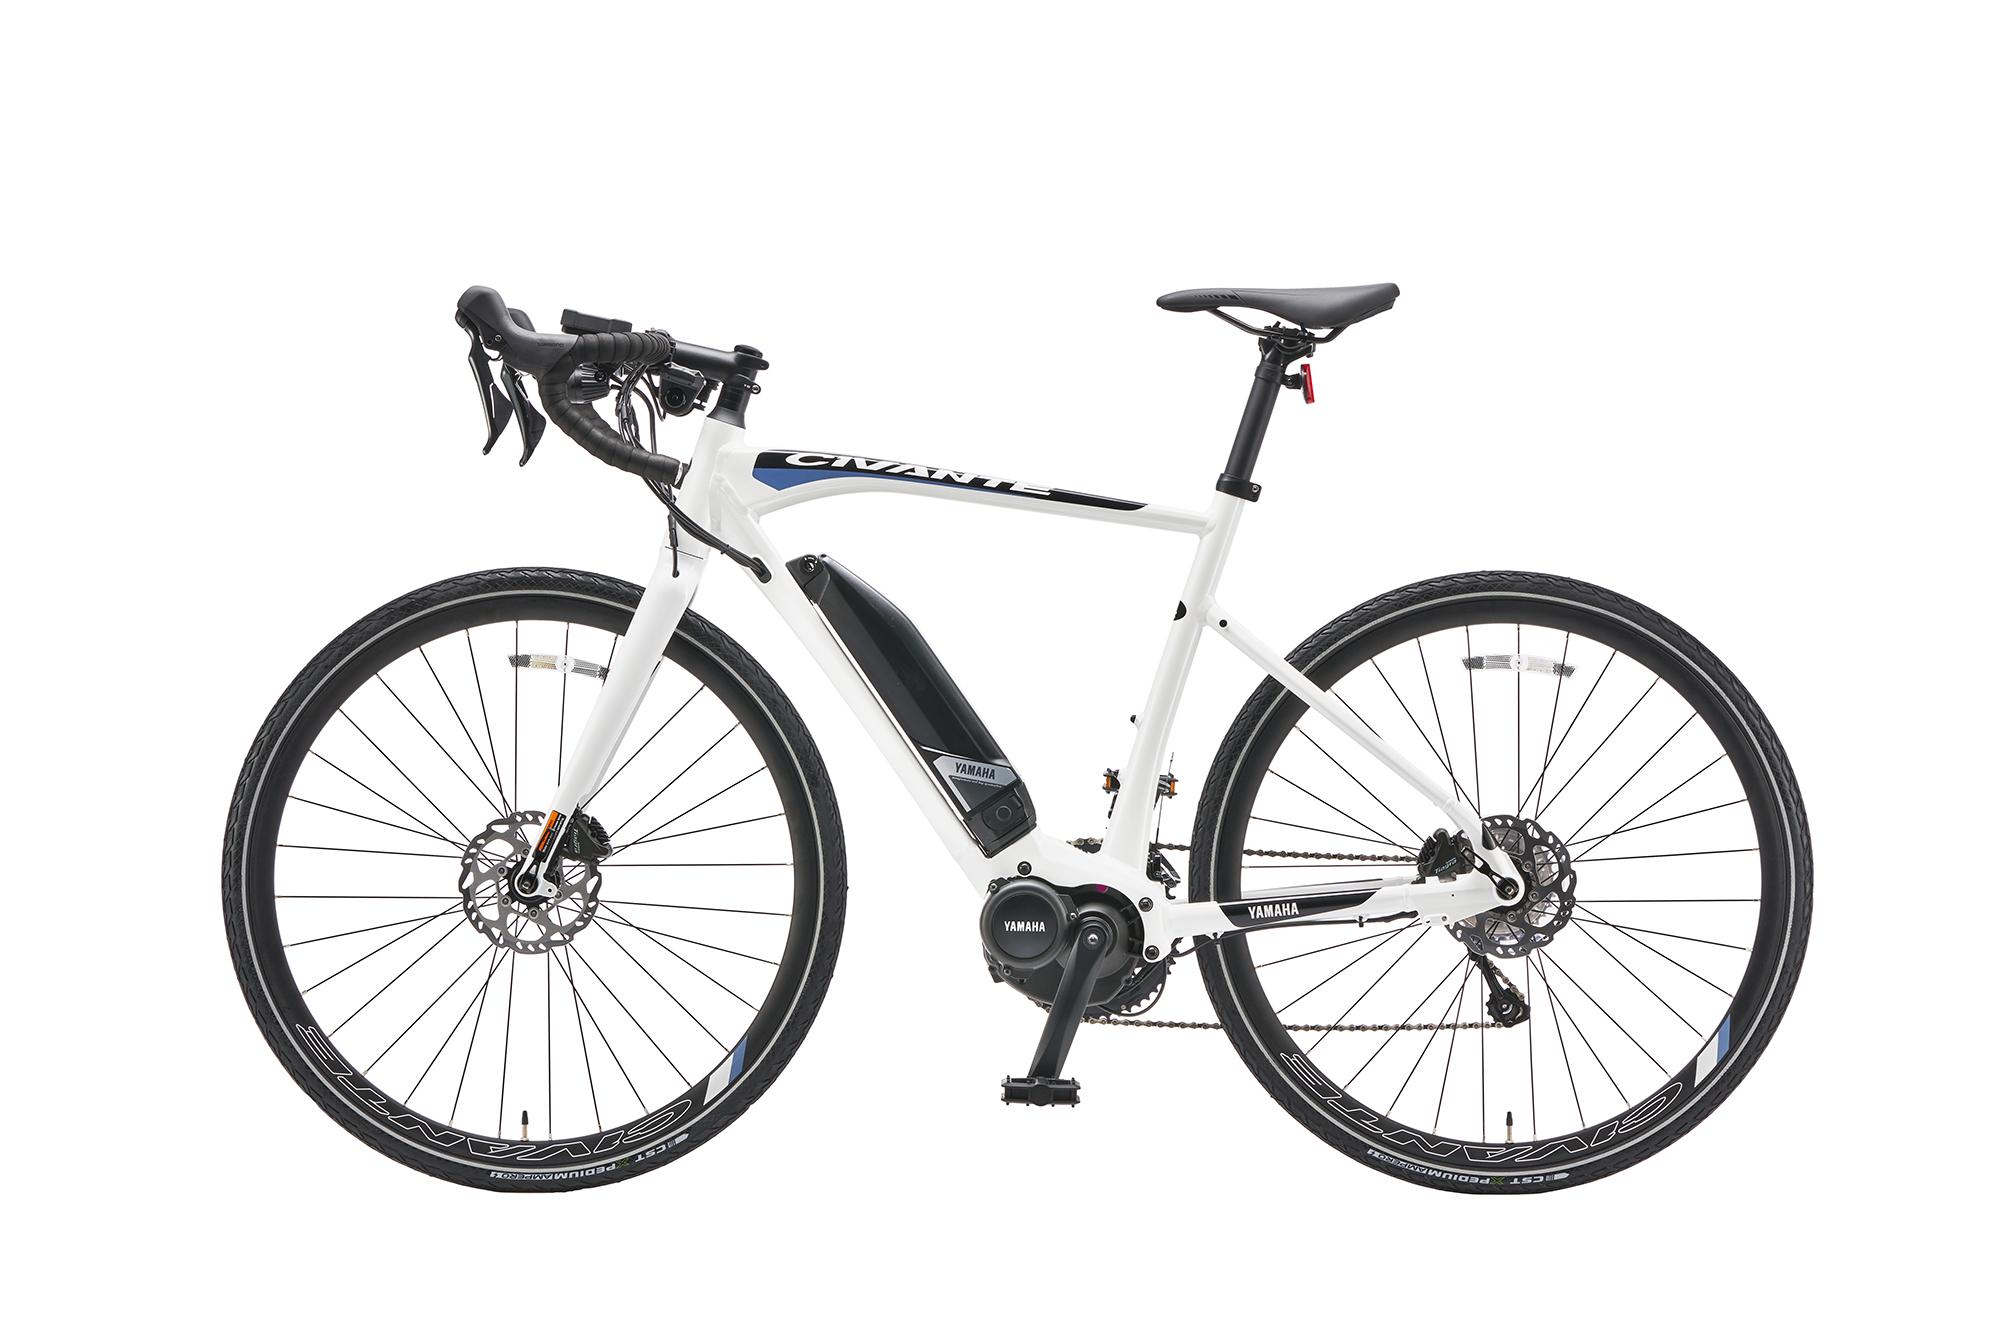 200709 Yamaha Announces New Civante Class 3 Road e-Bike in U.S.